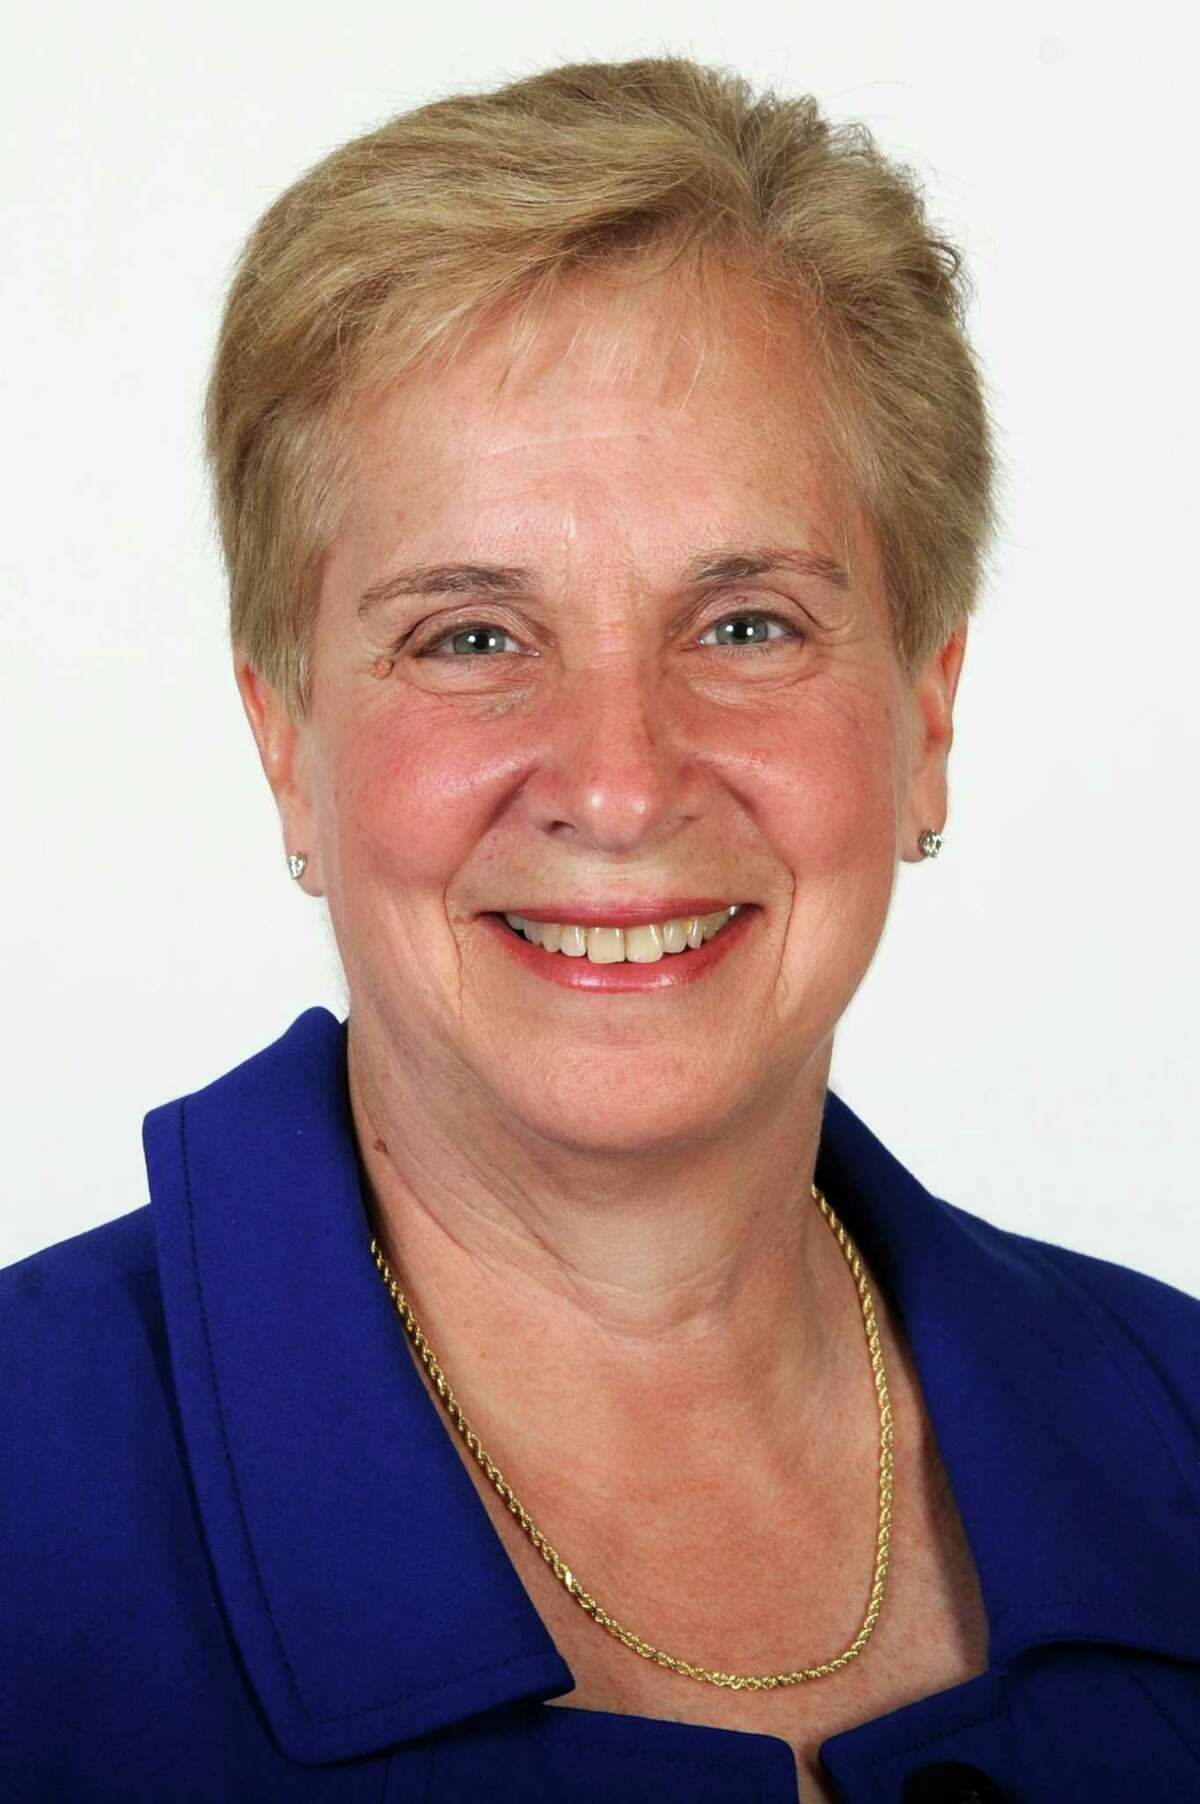 Vicki Tesoro, Trumbull first selectman elect.